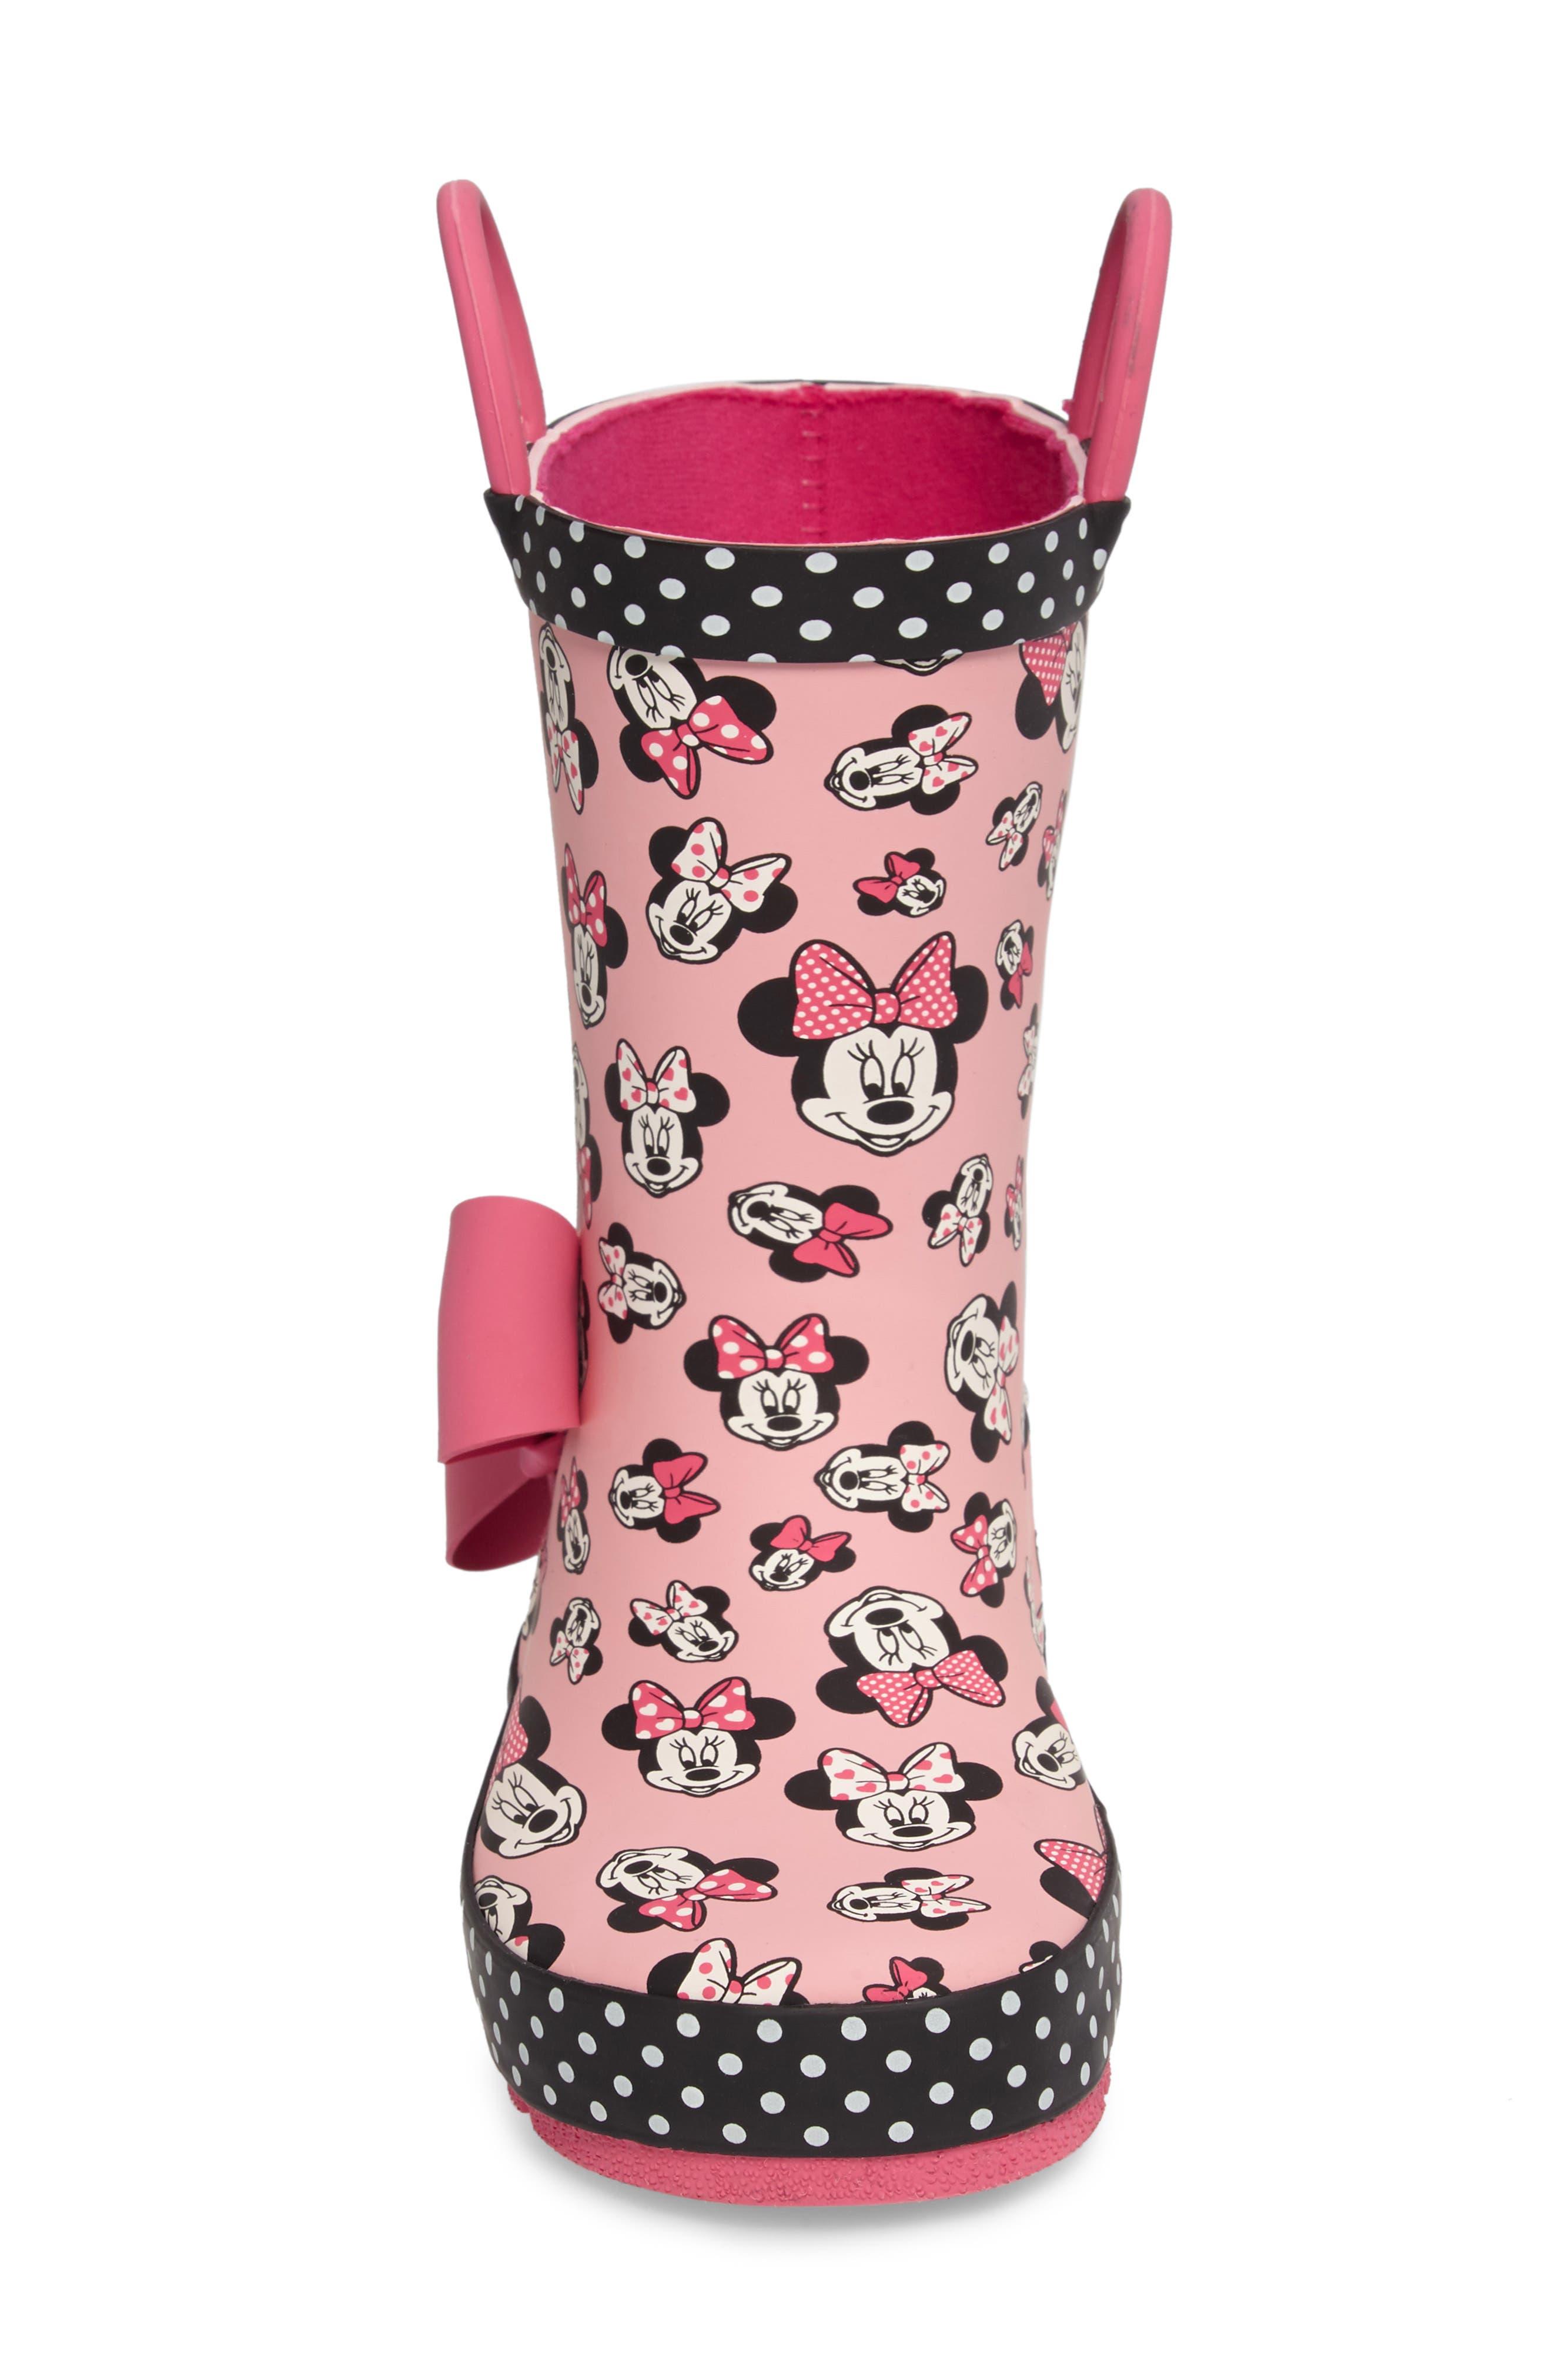 Disney<sup>®</sup> Minnie Mouse Waterproof Rain Boot,                             Alternate thumbnail 4, color,                             680